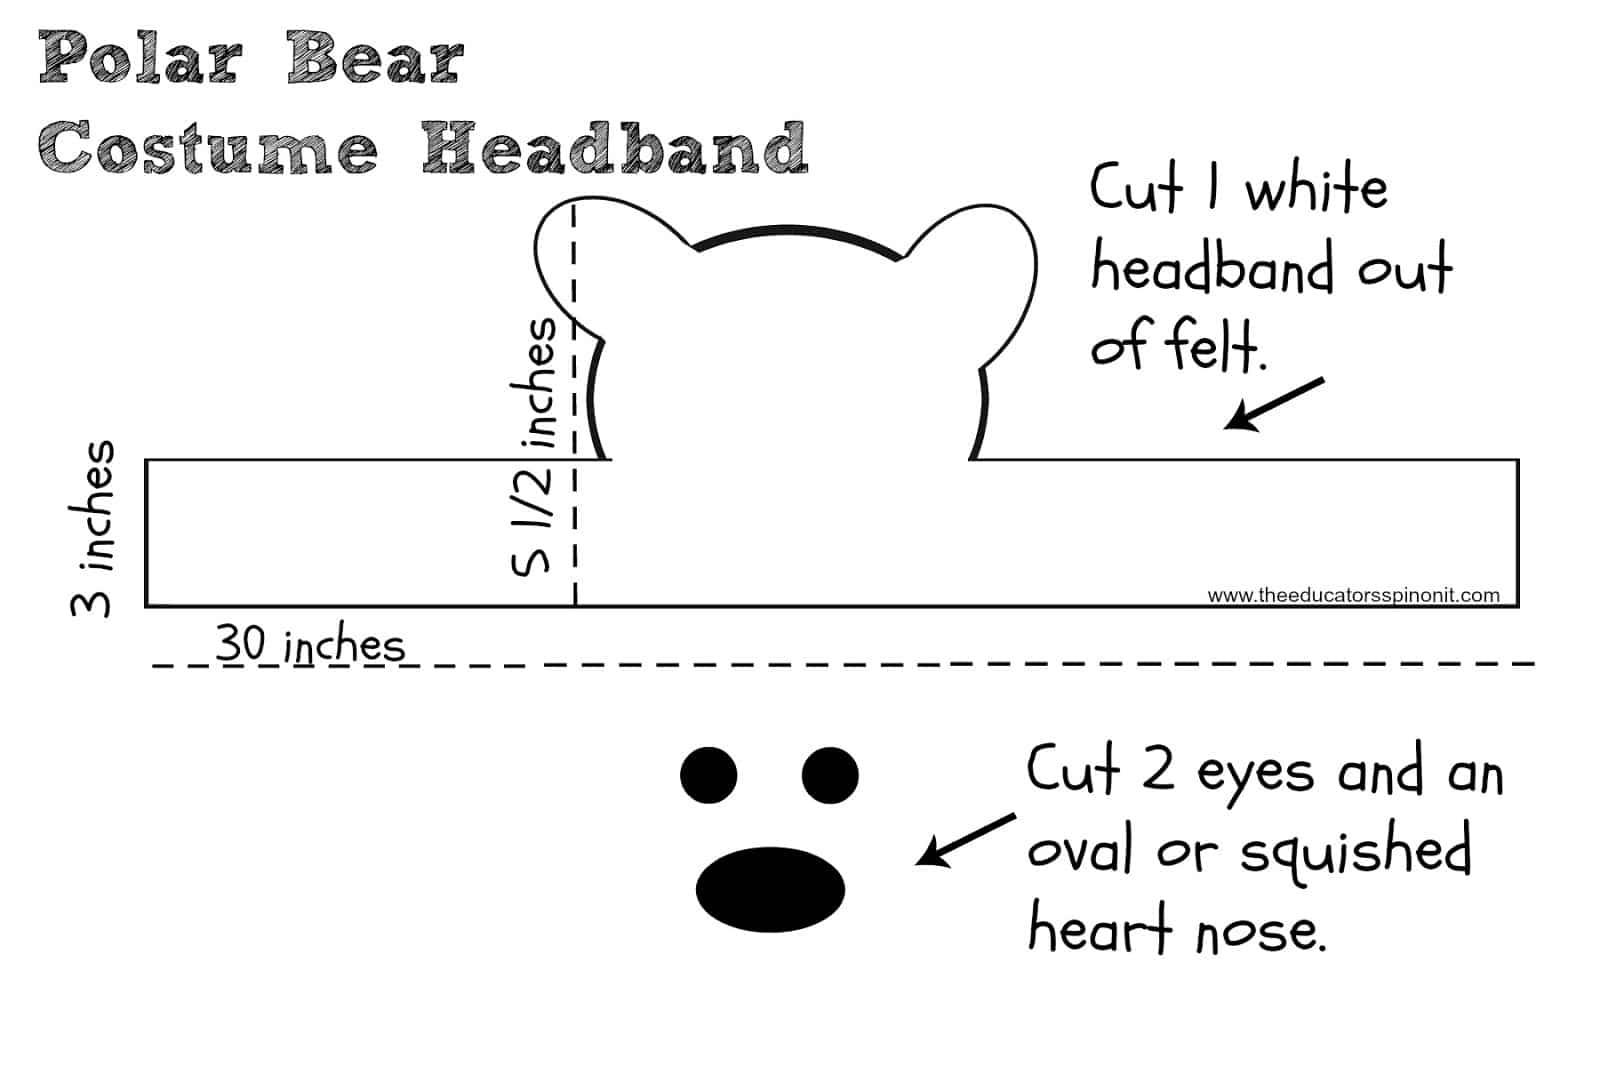 polar bear costume headband for kids the educators u0027 spin on it